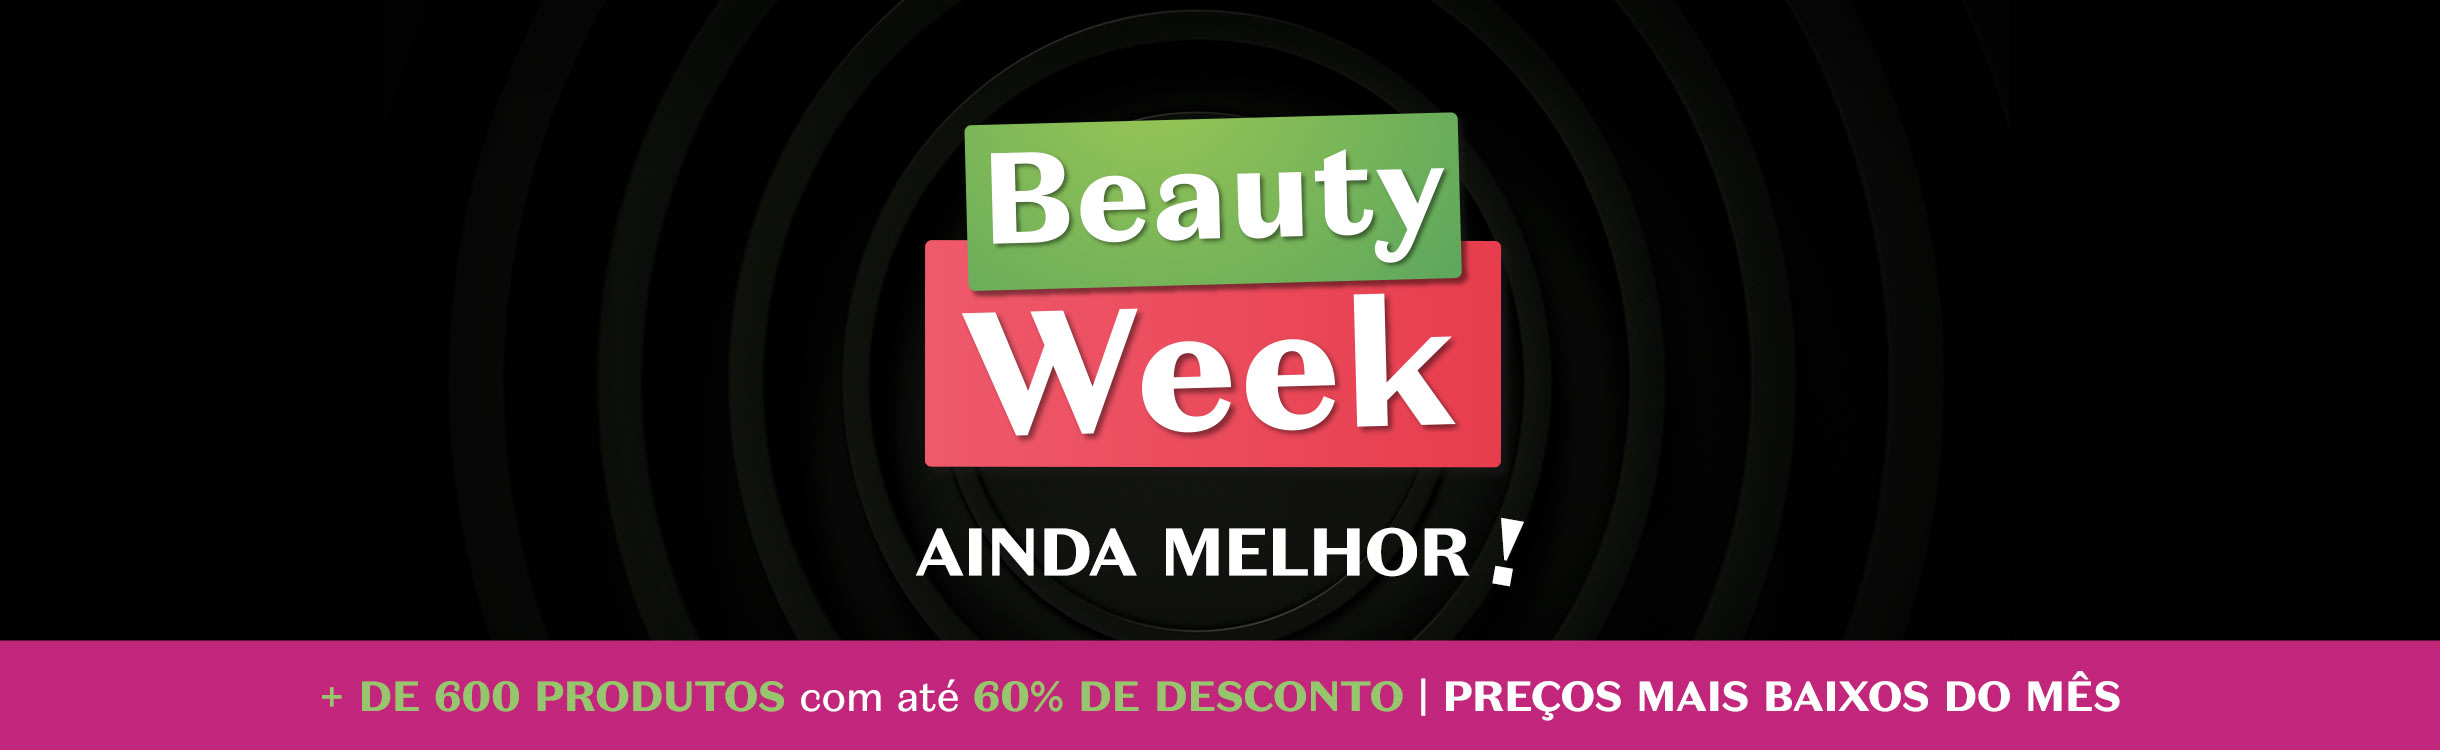 Itens infantis em ofertas imperdíveis de Beauty Week!